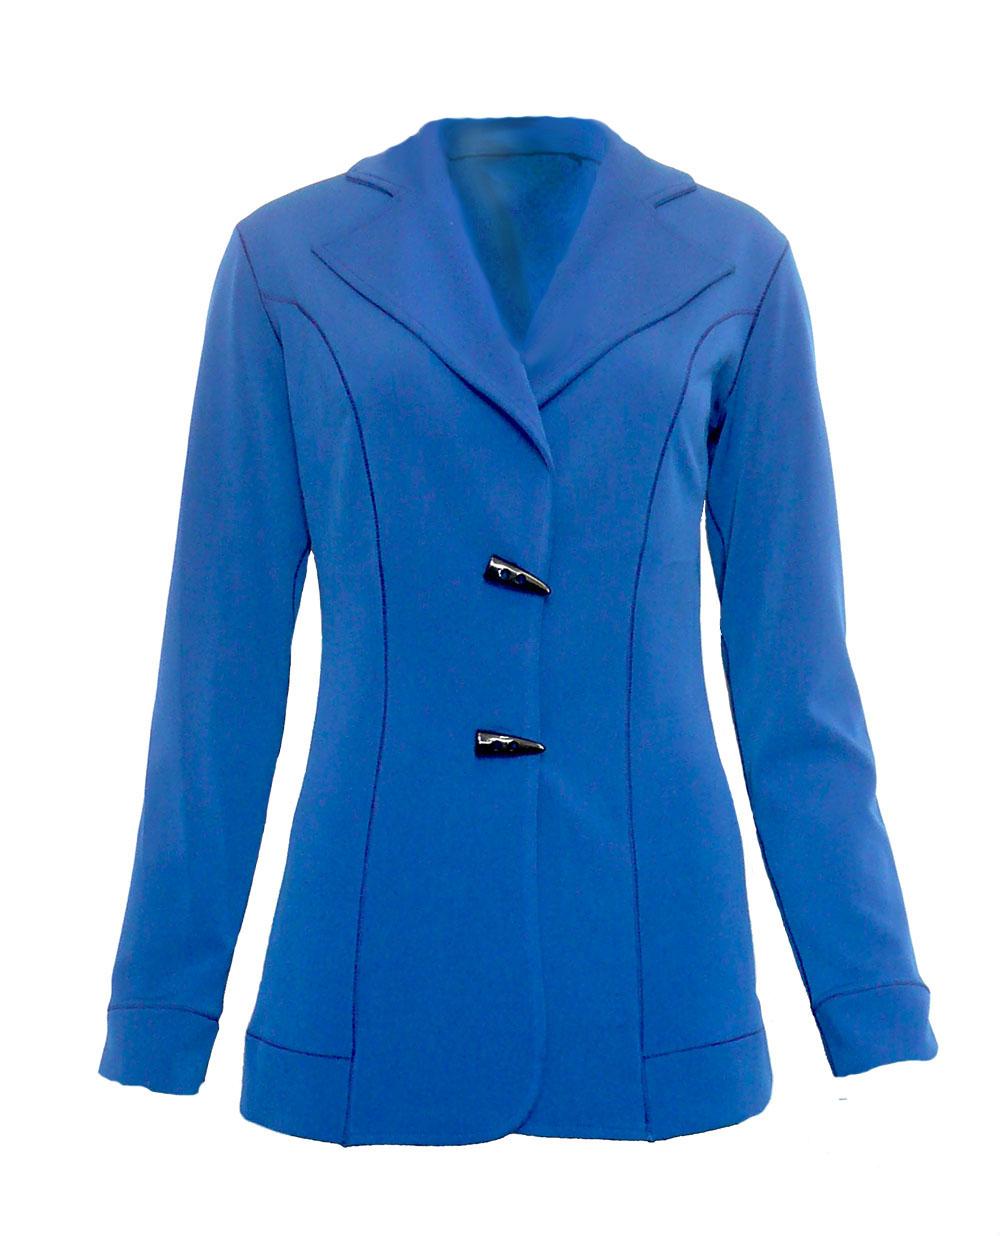 jacket royal.jpg